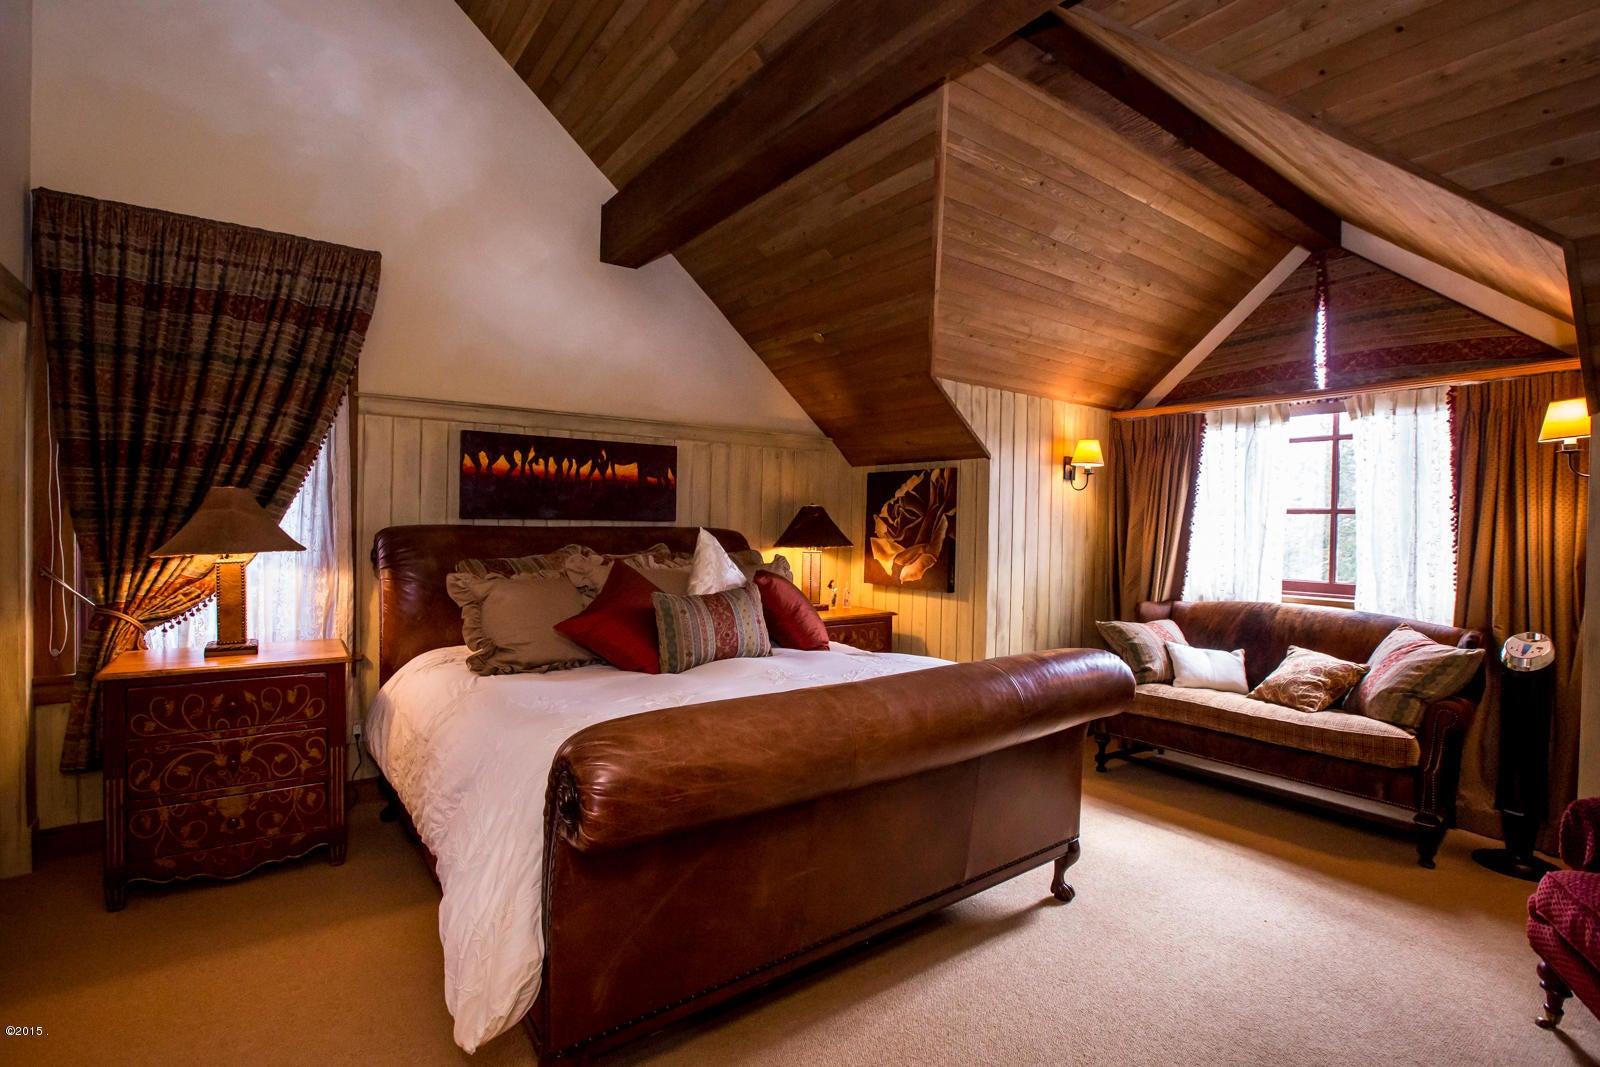 Additional photo for property listing at 2239 Larkspur Lane 2239 Larkspur Lane Whitefish, Montana 59937 United States